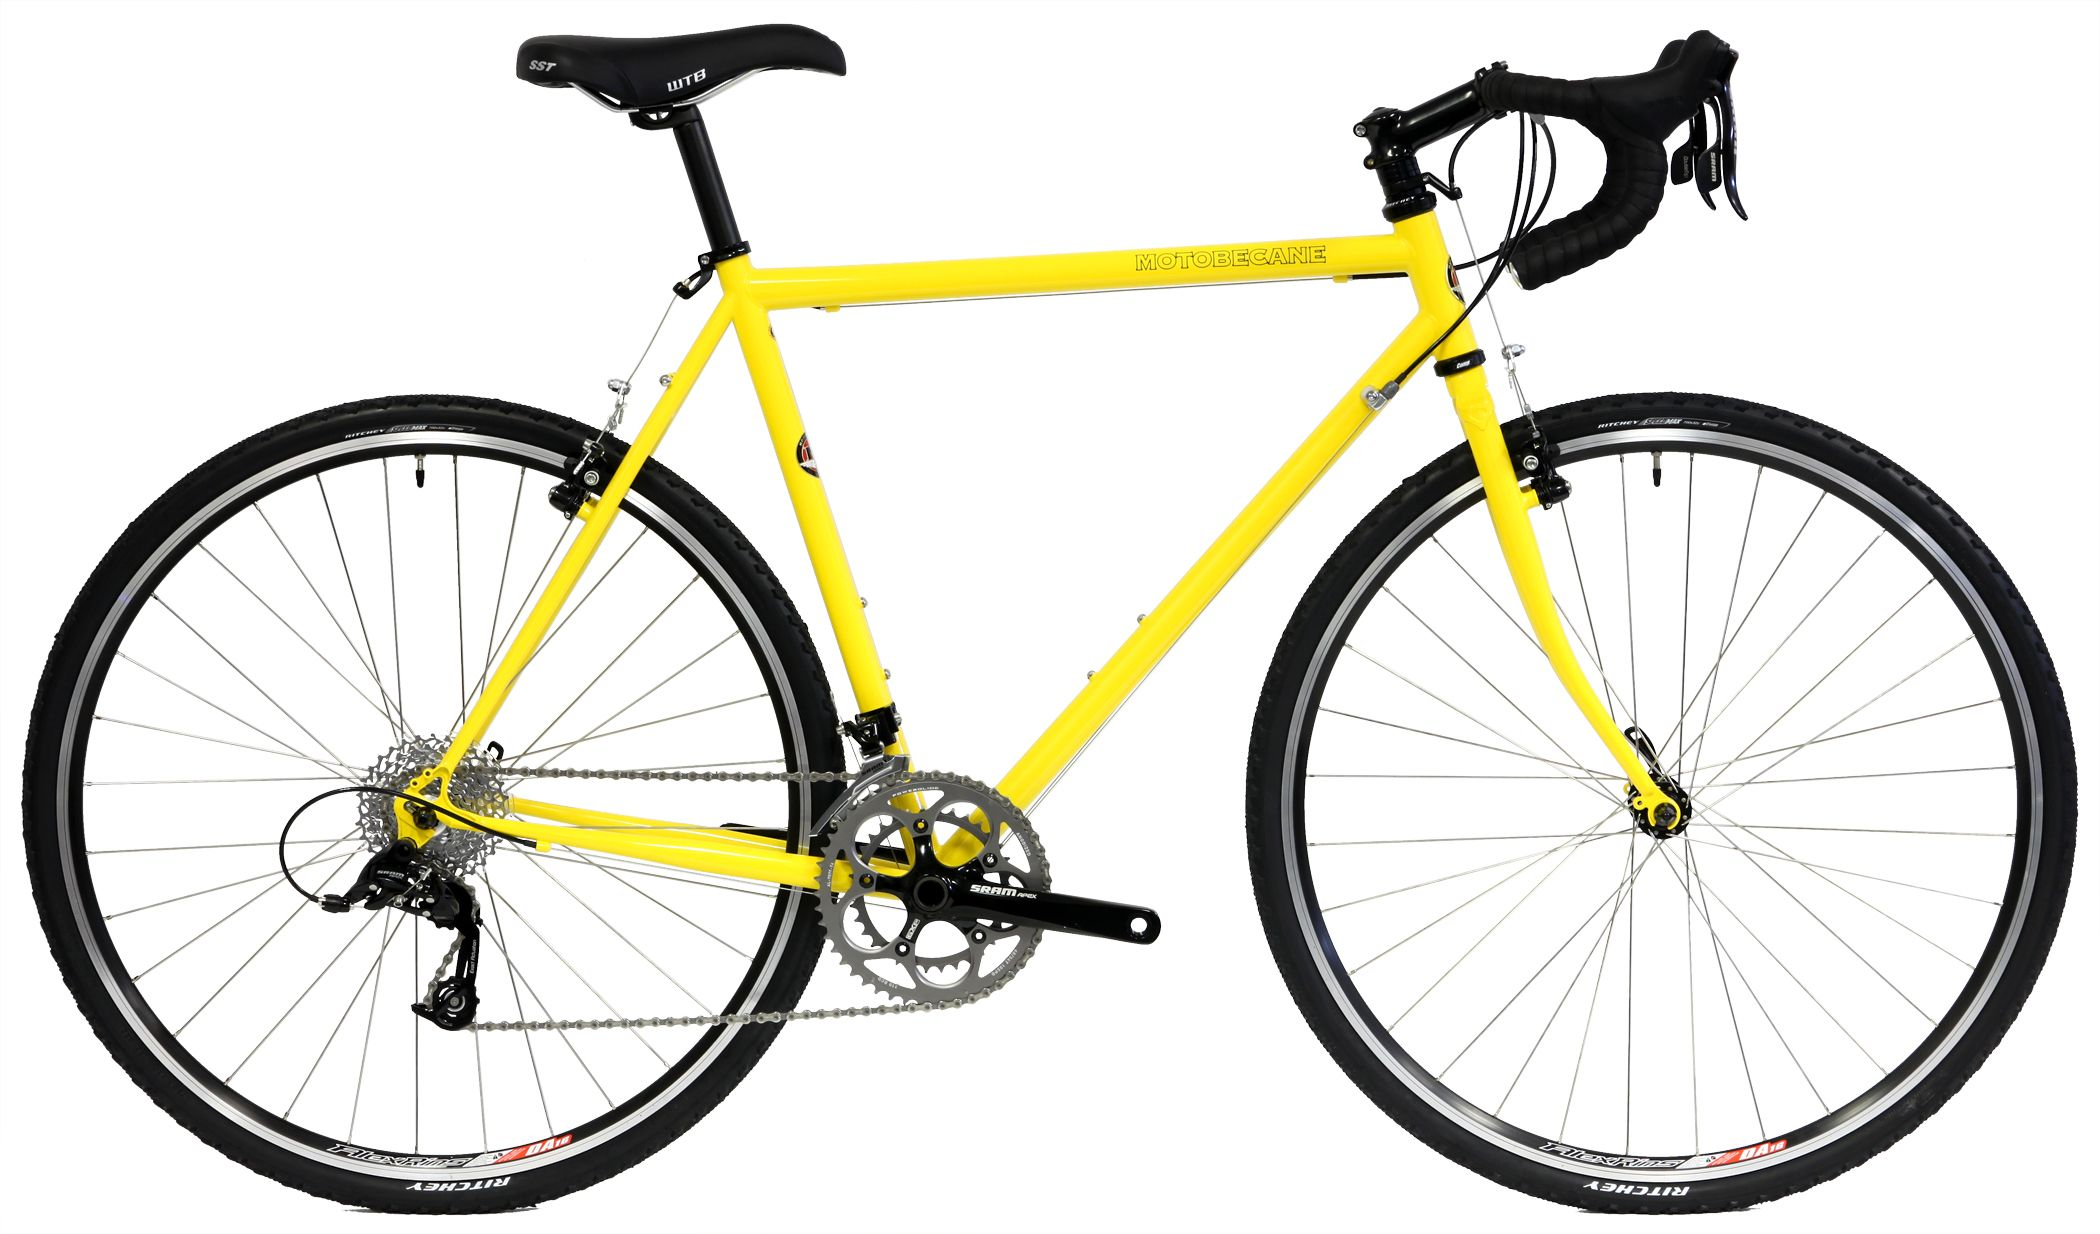 Motobecane Fantom Cross Cxx Schwinn Bike Bike Road Bikes